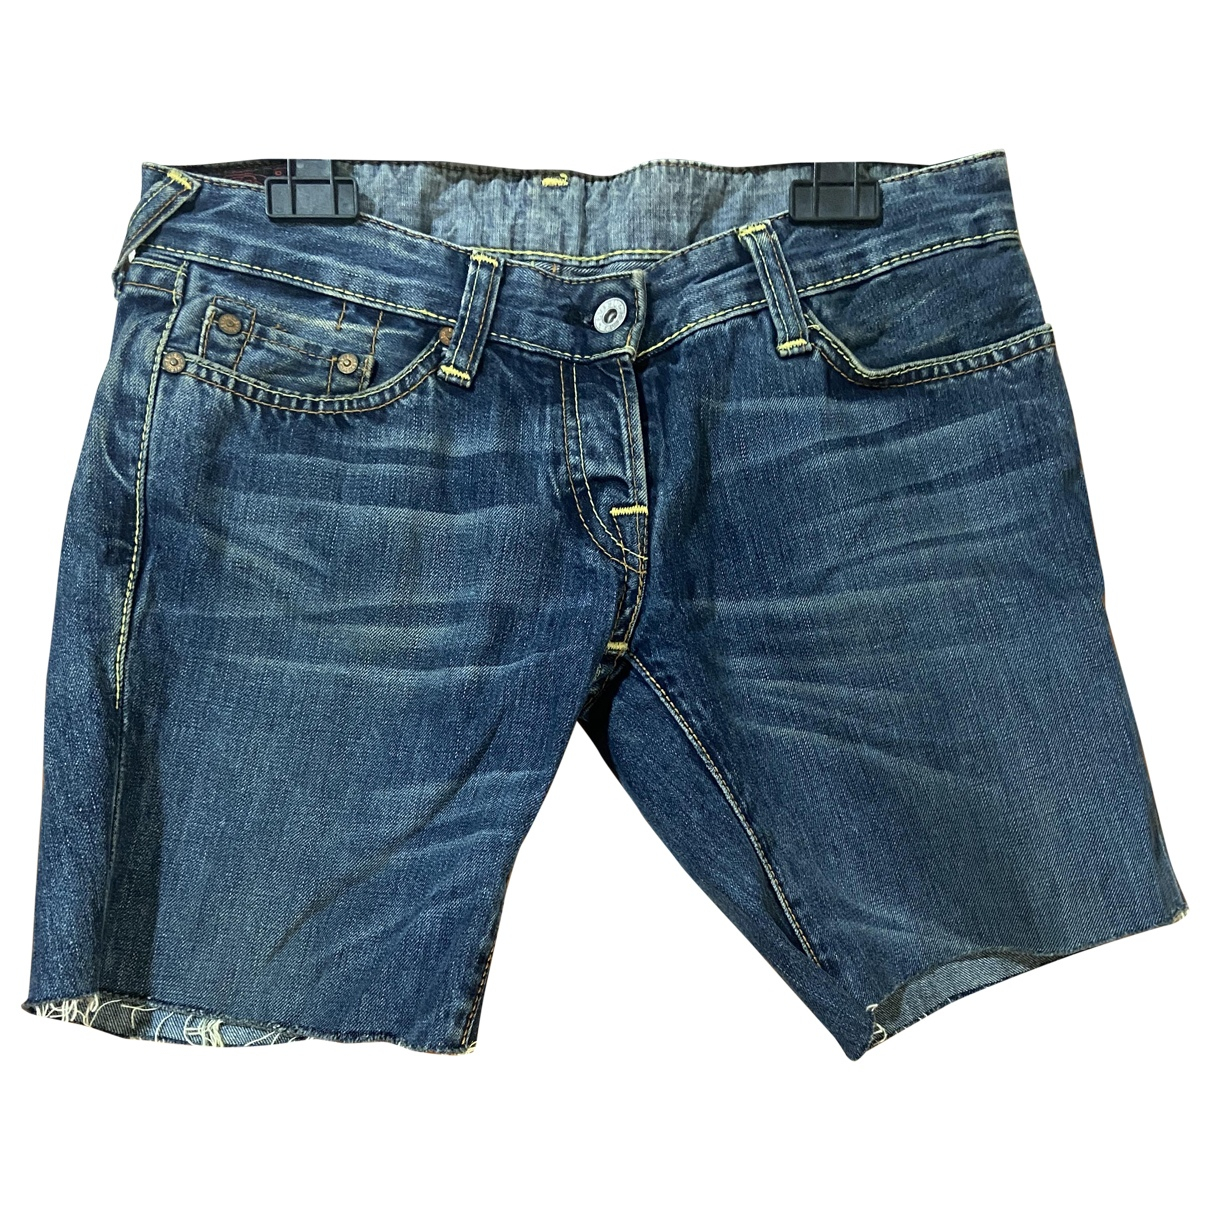 Evisu \N Shorts in Denim - Jeans